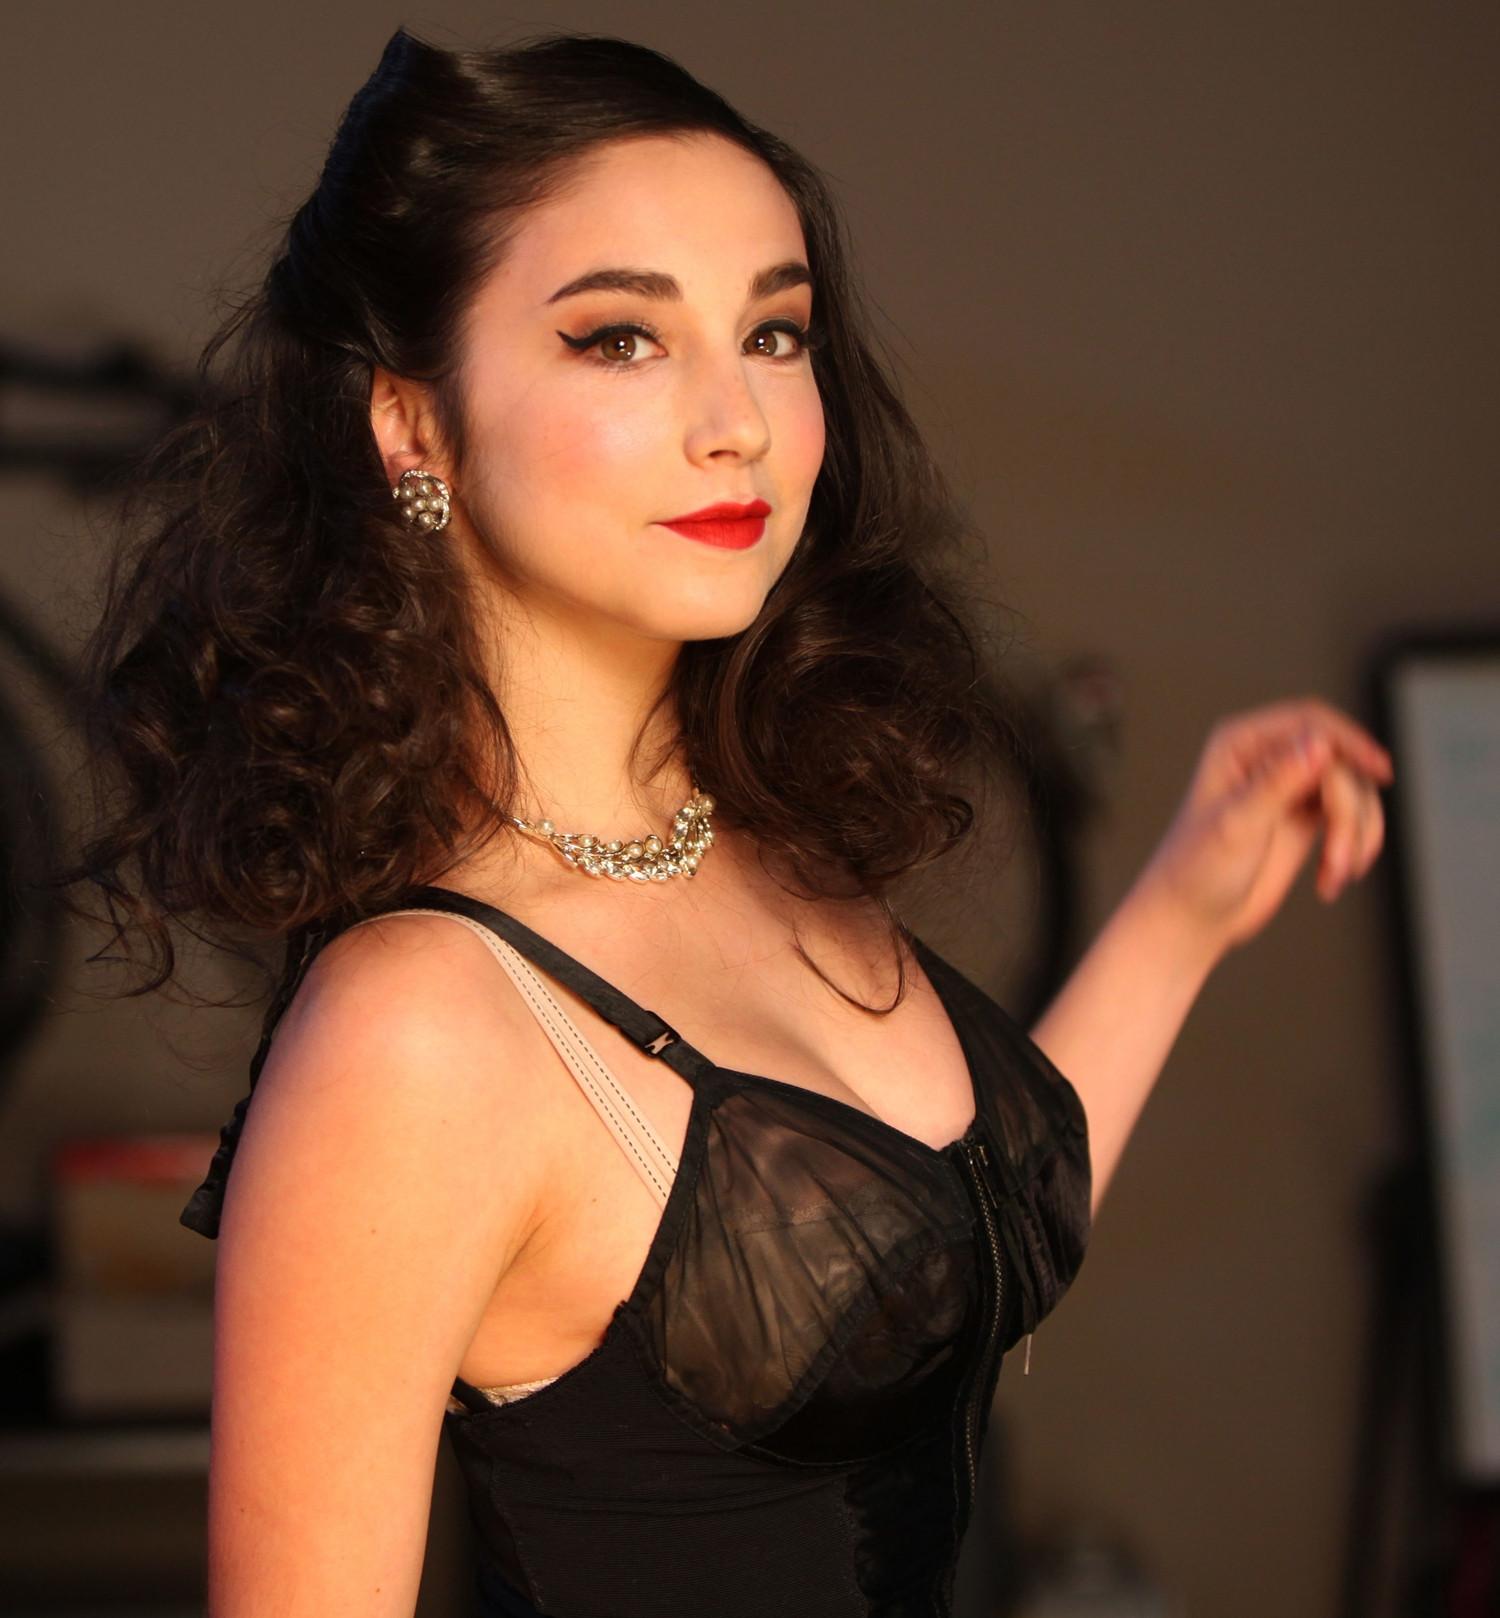 Megan Markle Imdb >> Molly Ephraim Hot Bikini Images, Sexy Photos & Videos